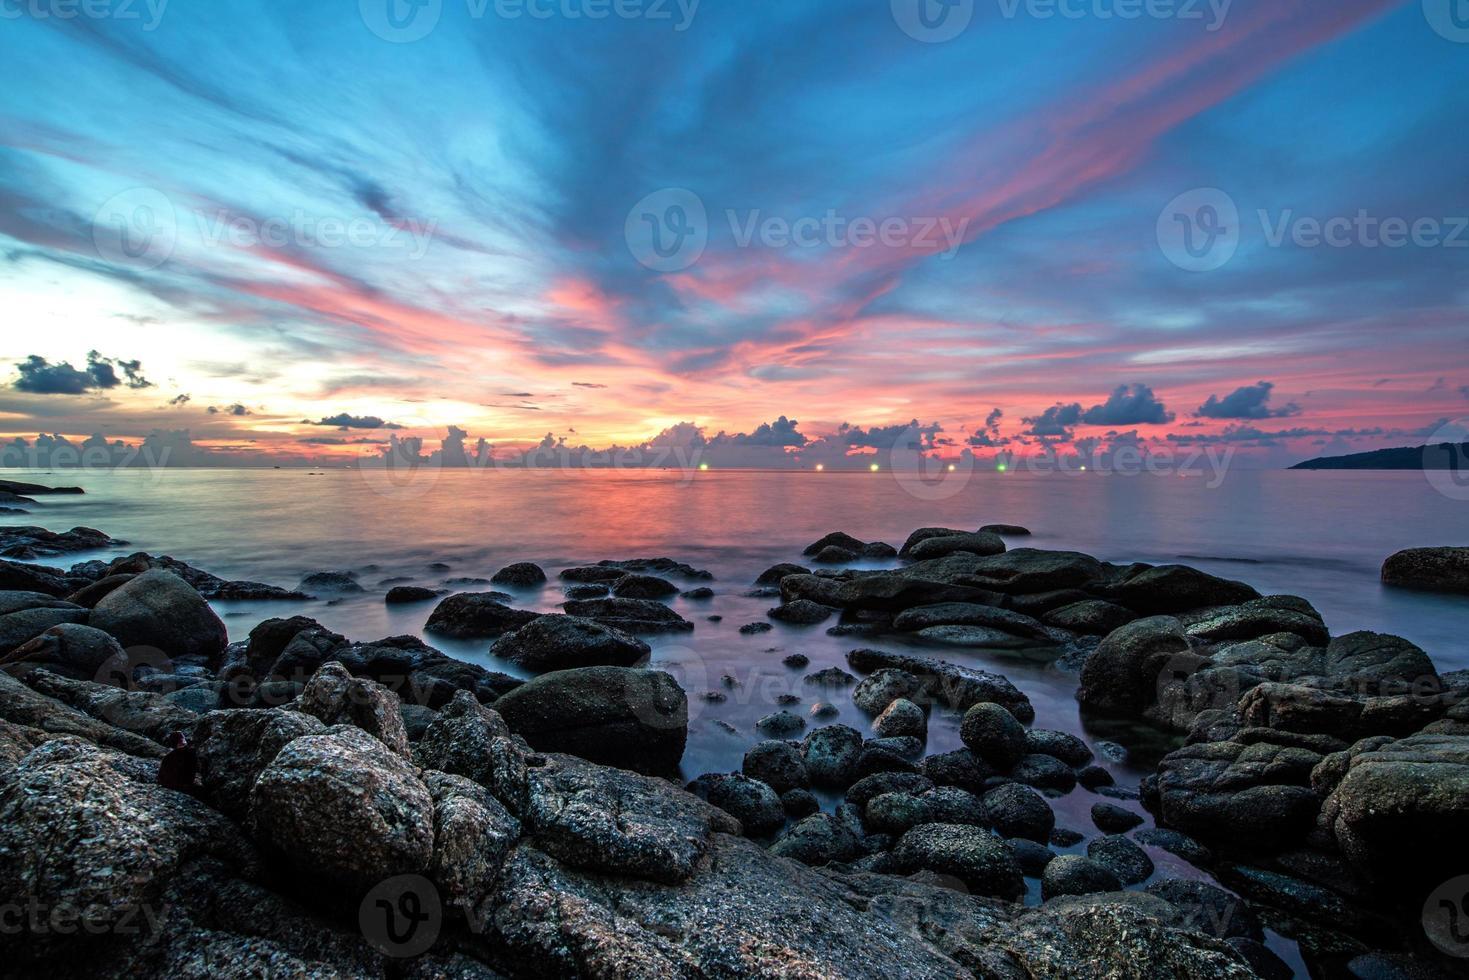 Seascape during sunset. Beautiful natural seascape photo